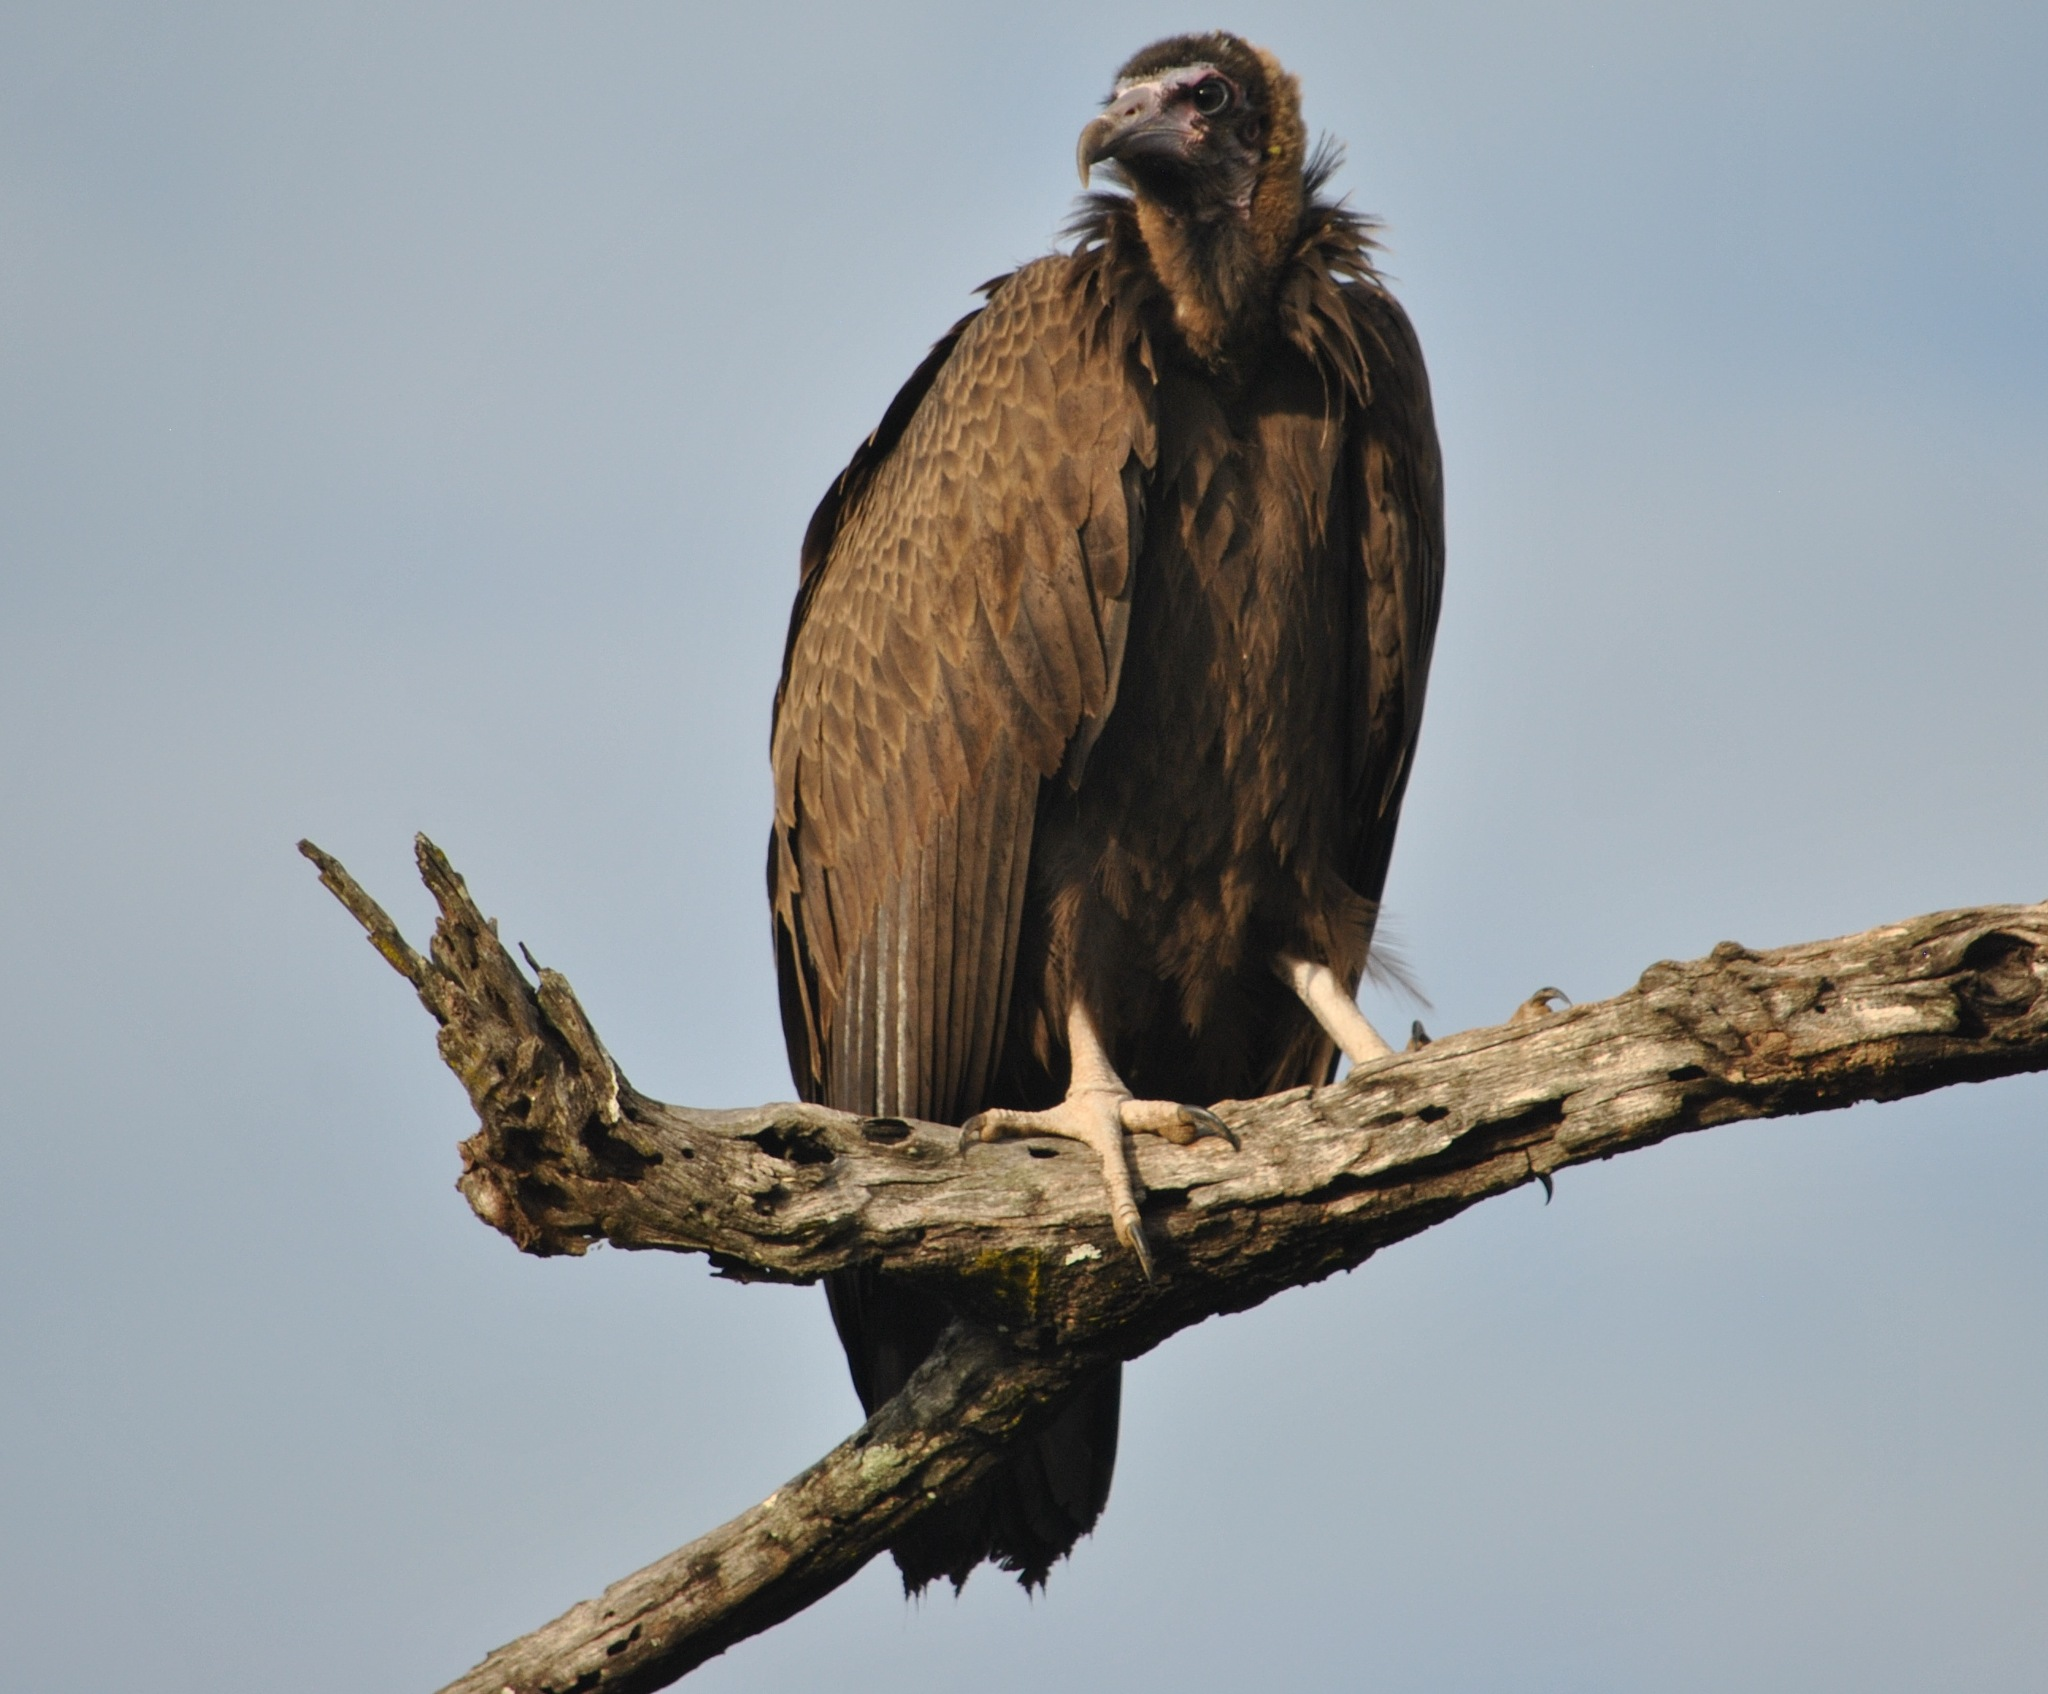 Hooded Vulture by godfreyanker